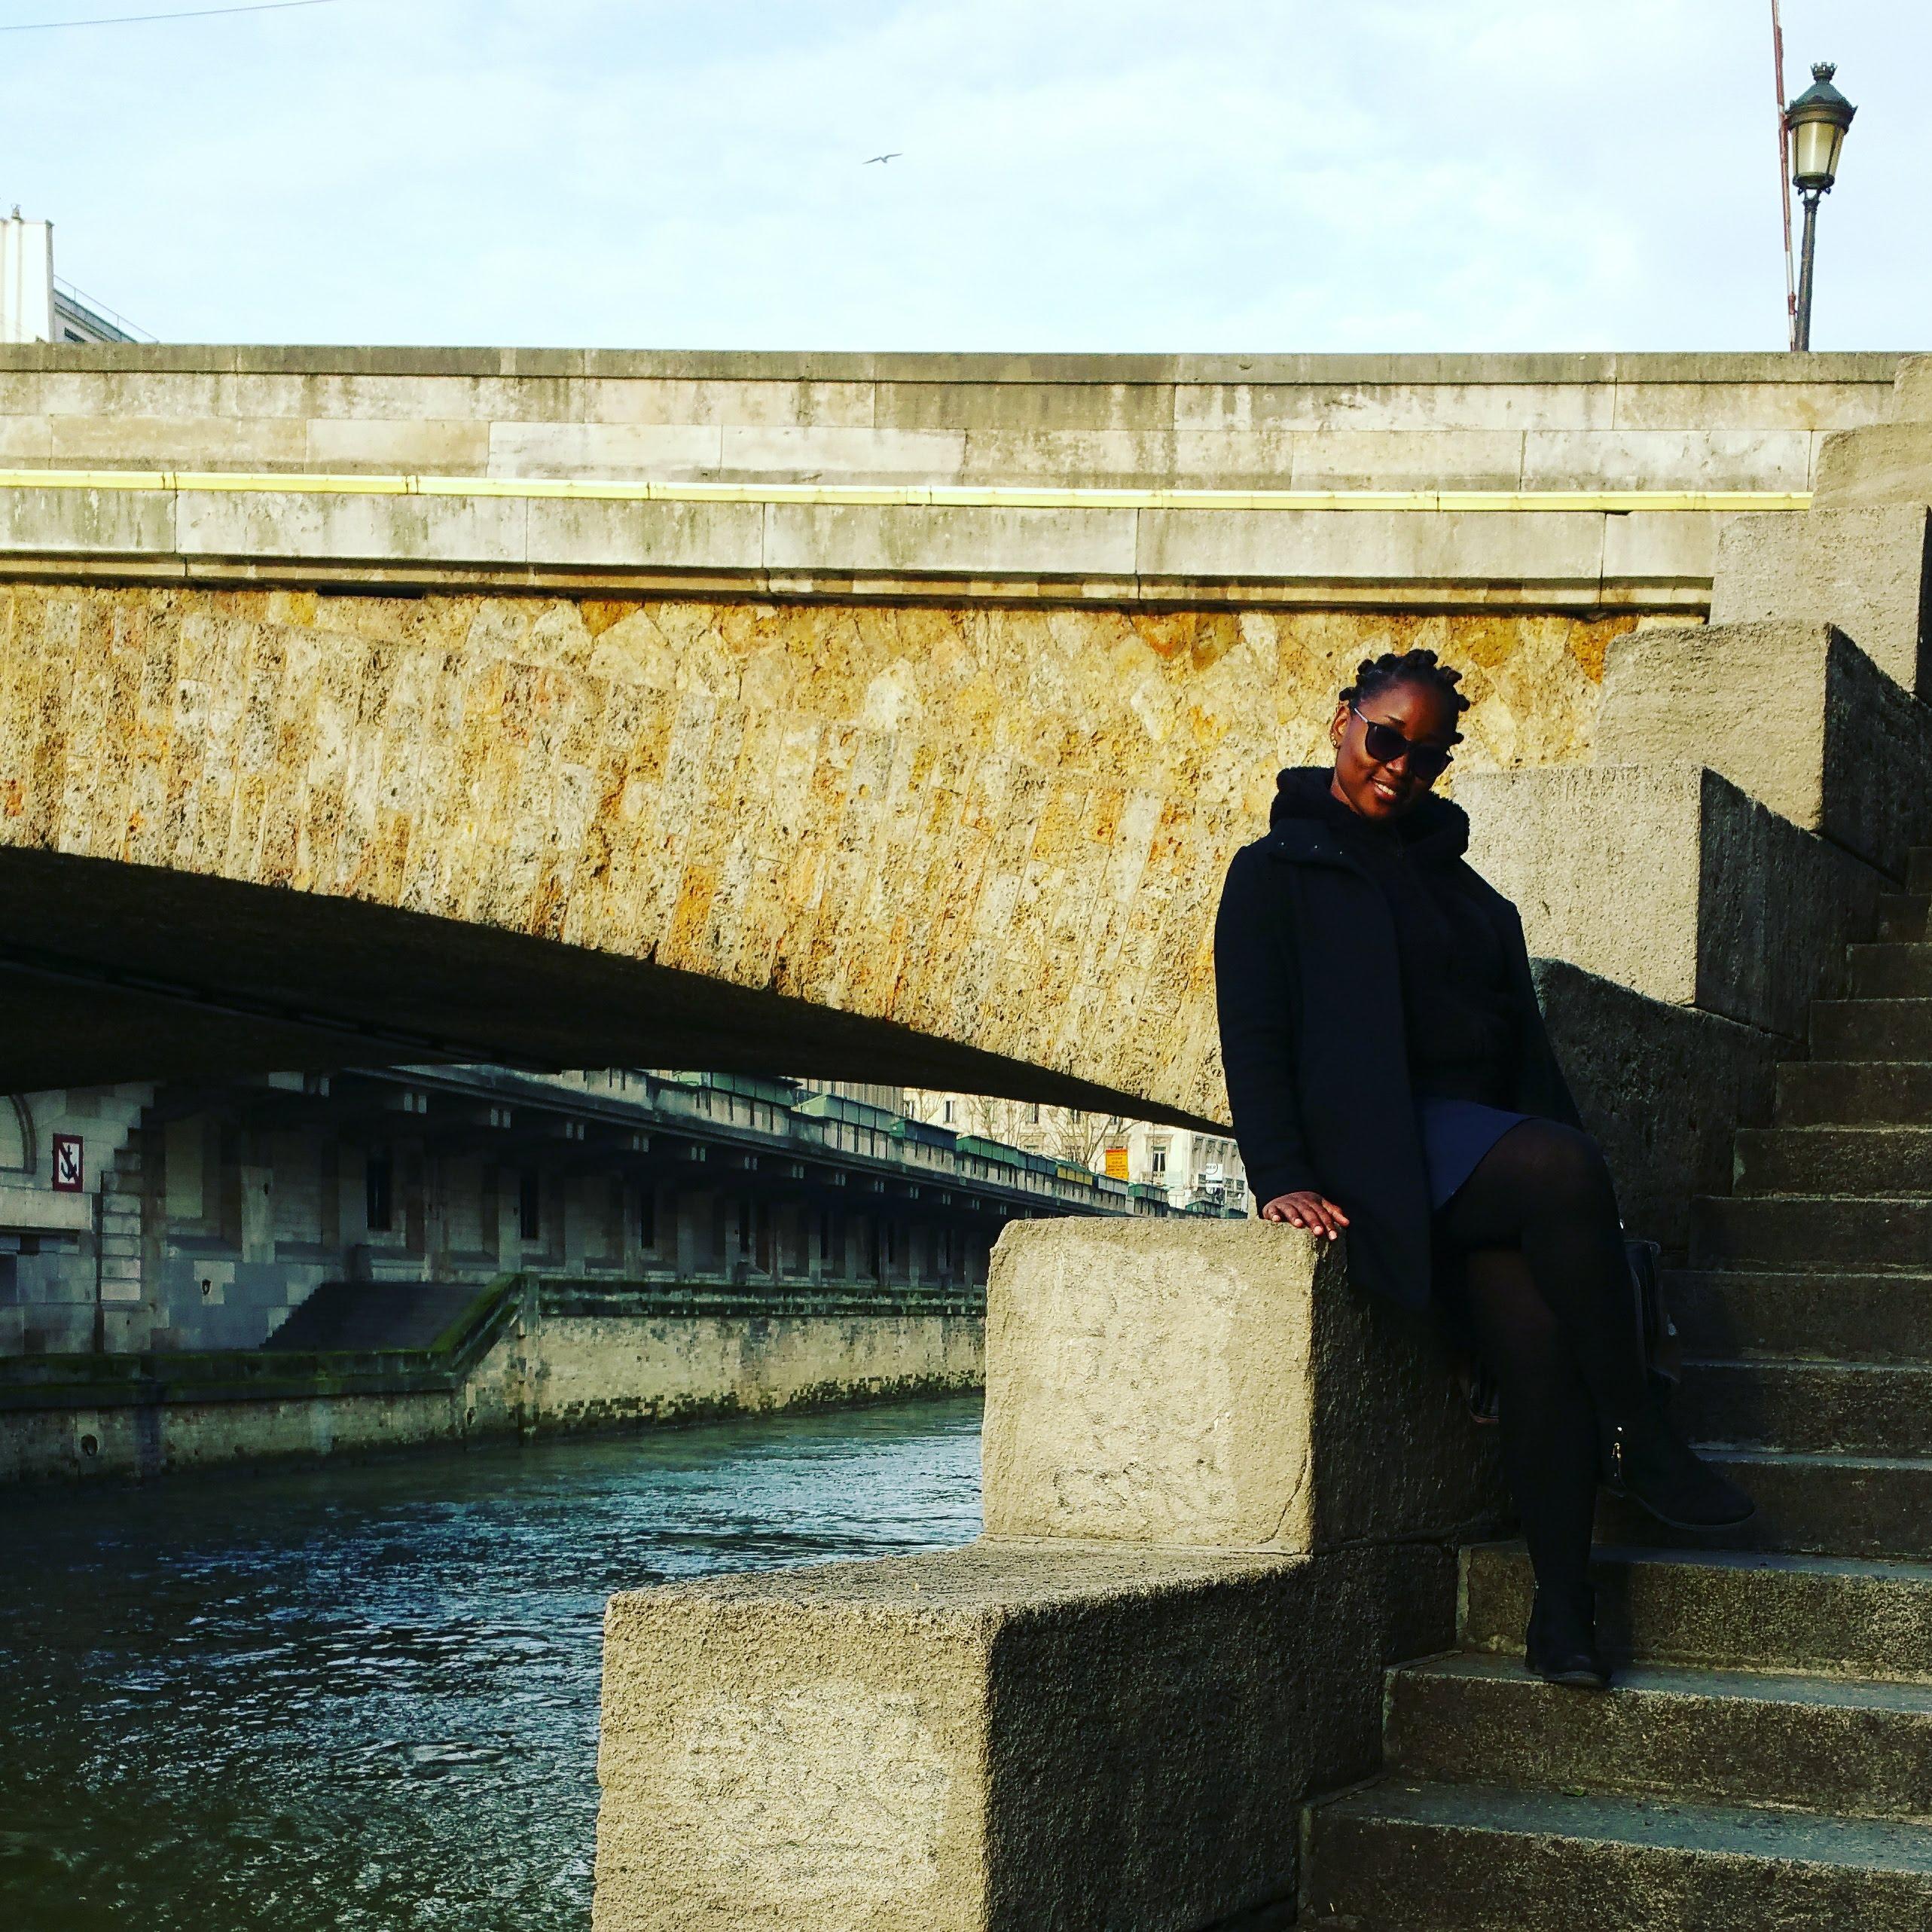 Seine River, France | 2016